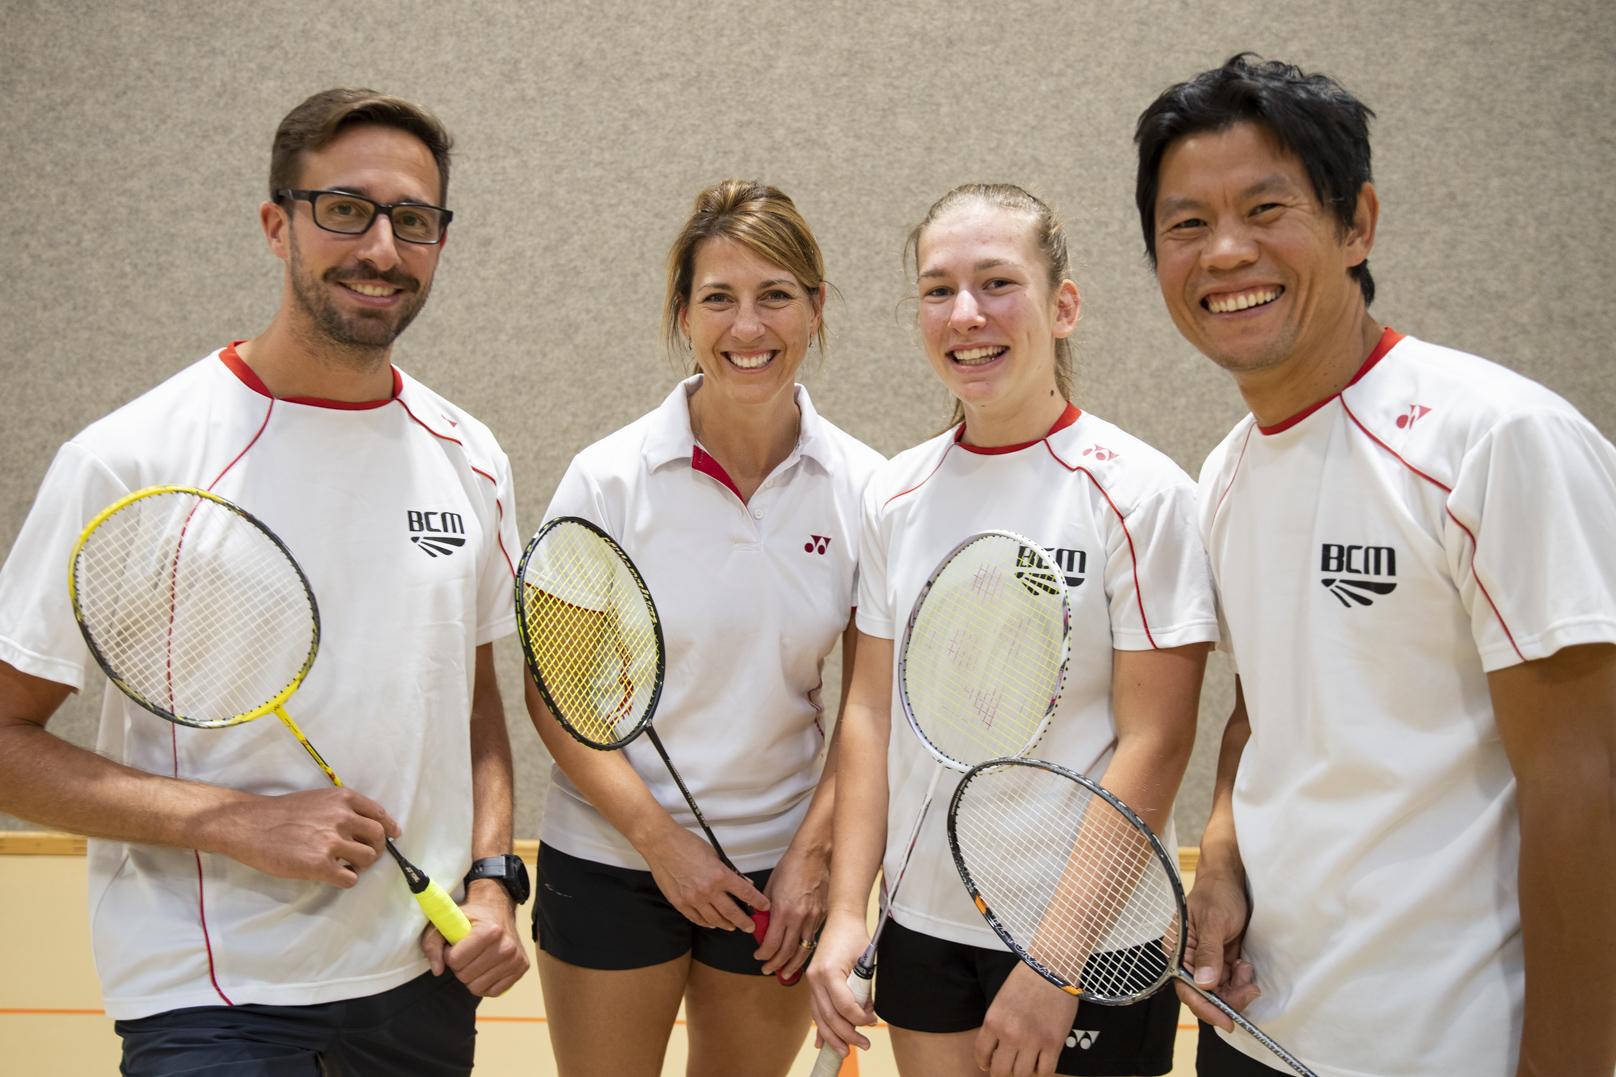 Le Badminton Club Morges reprend fort